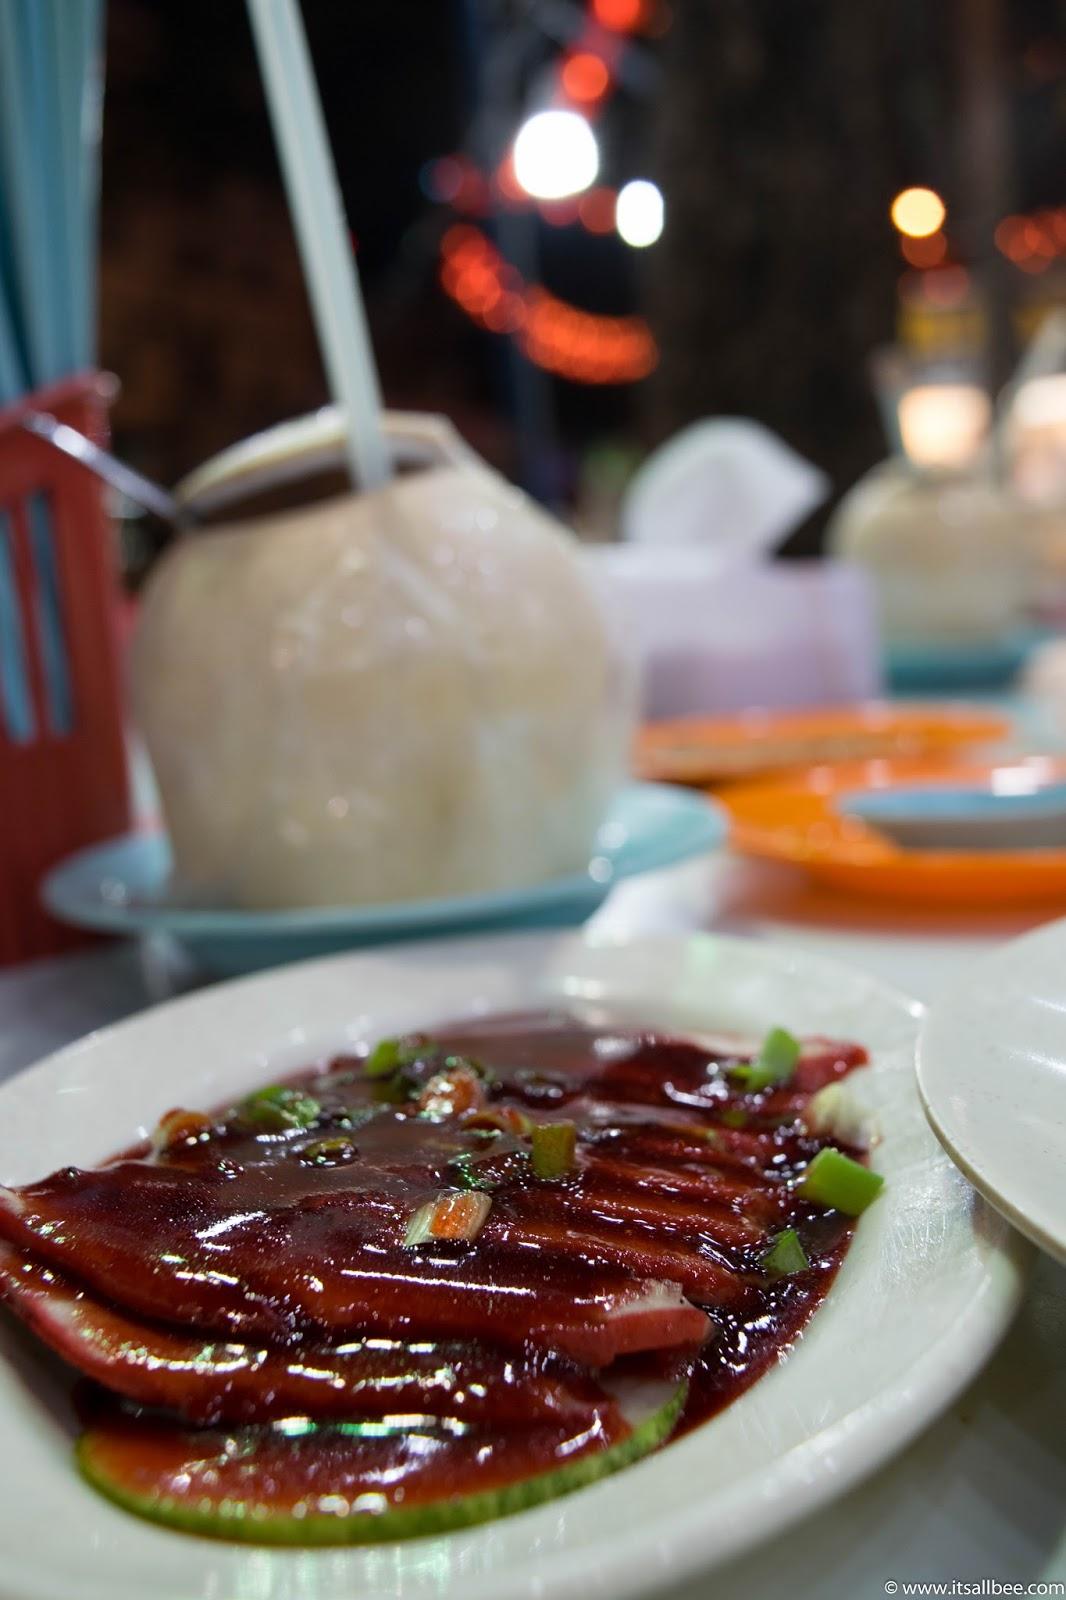 Kuala Lumpur | A Culinary Tour Through Chinatown